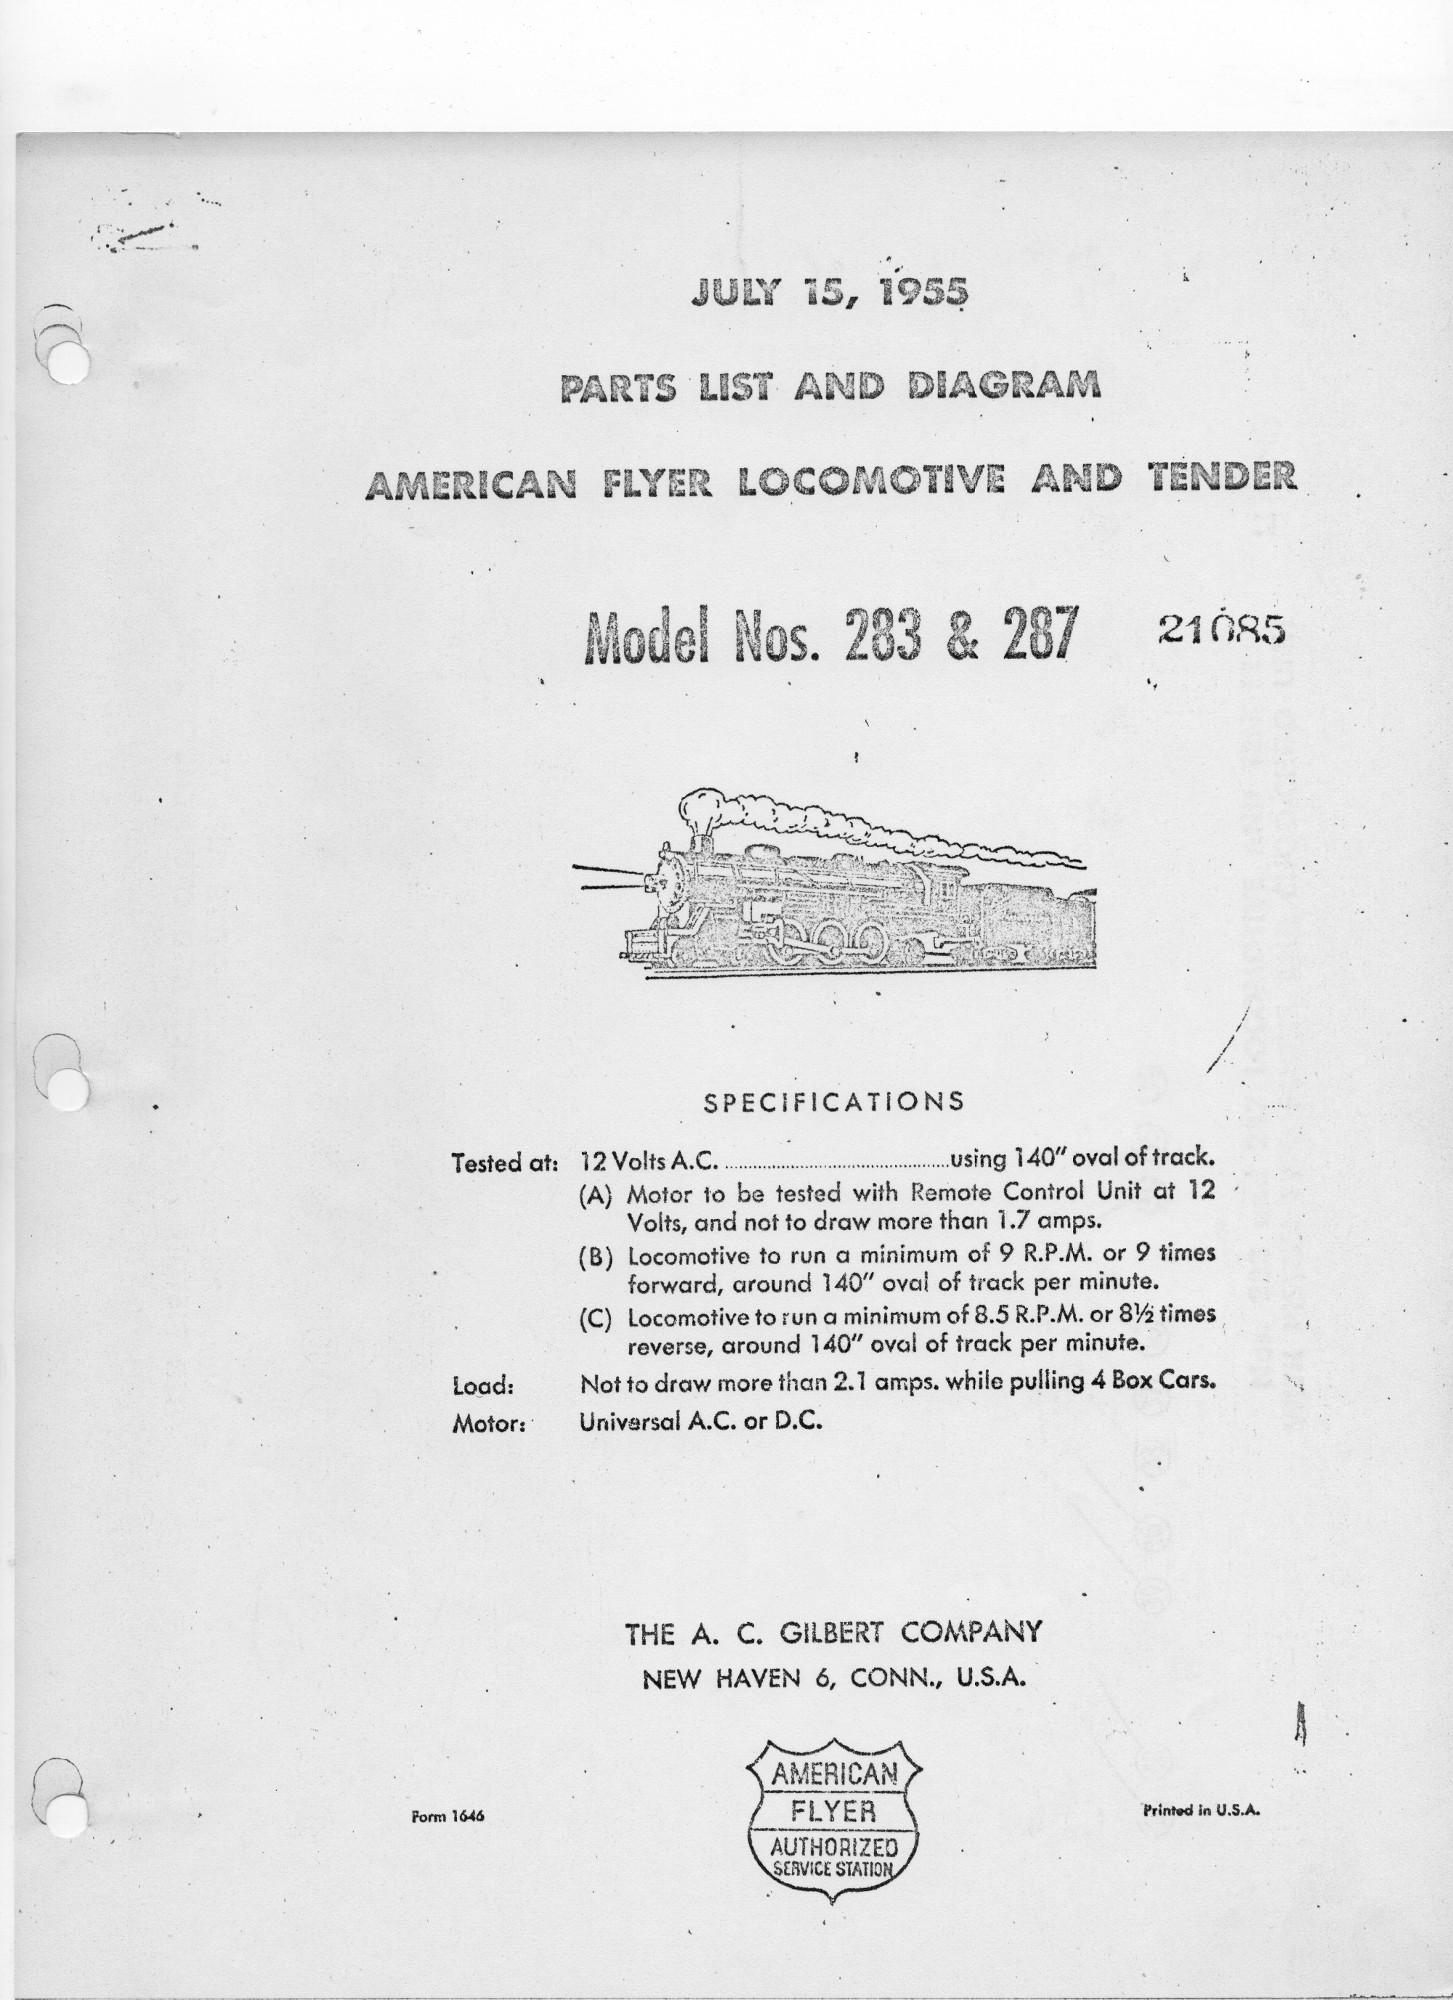 American Flyer Locomotive 283 & 287 Parts List and Diagram - Page 1ge 3